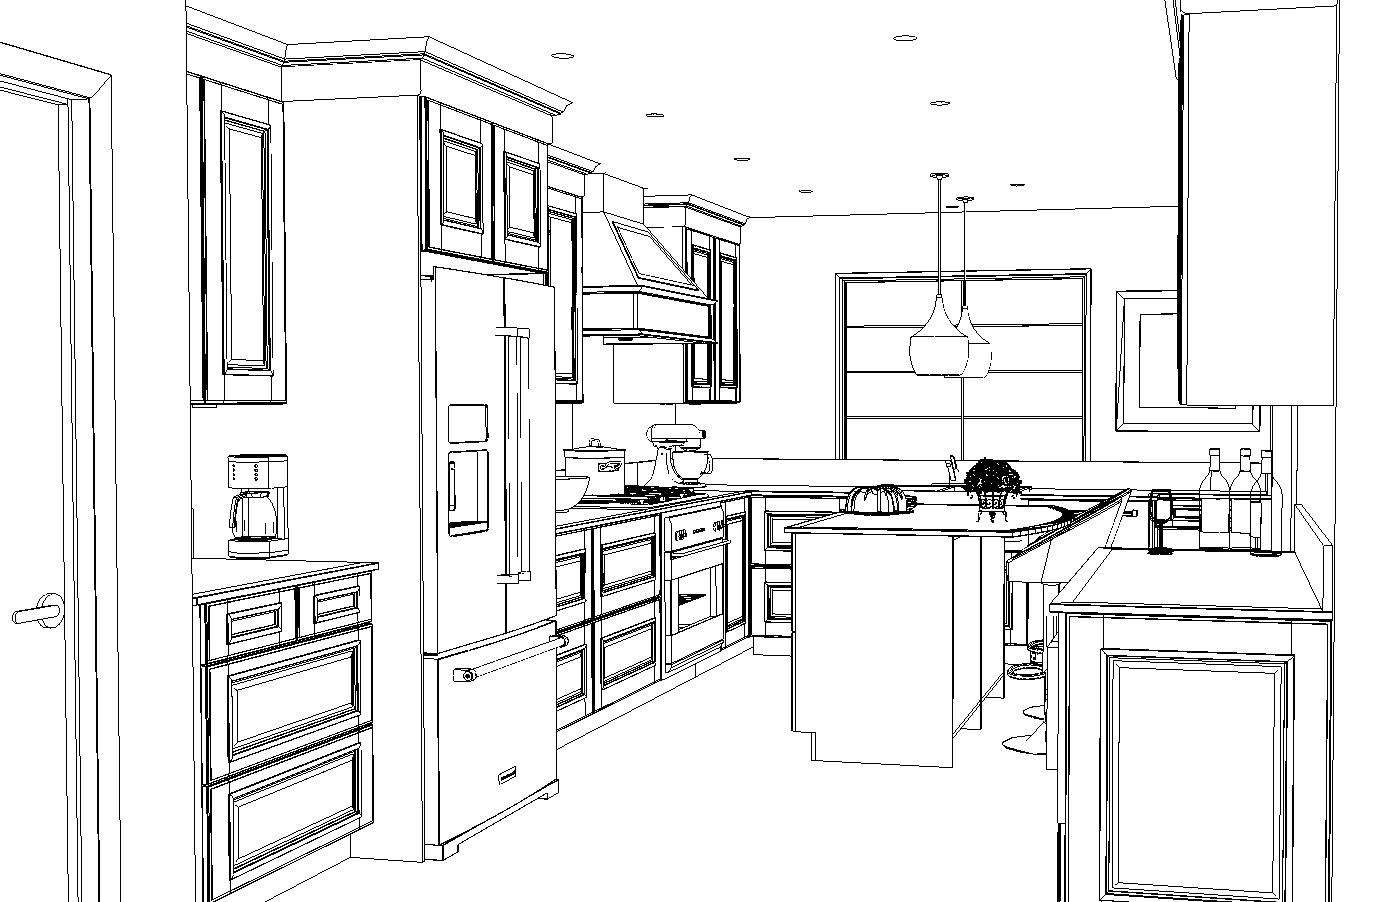 Free kitchen or bath design consultation - Free interior design consultation ...